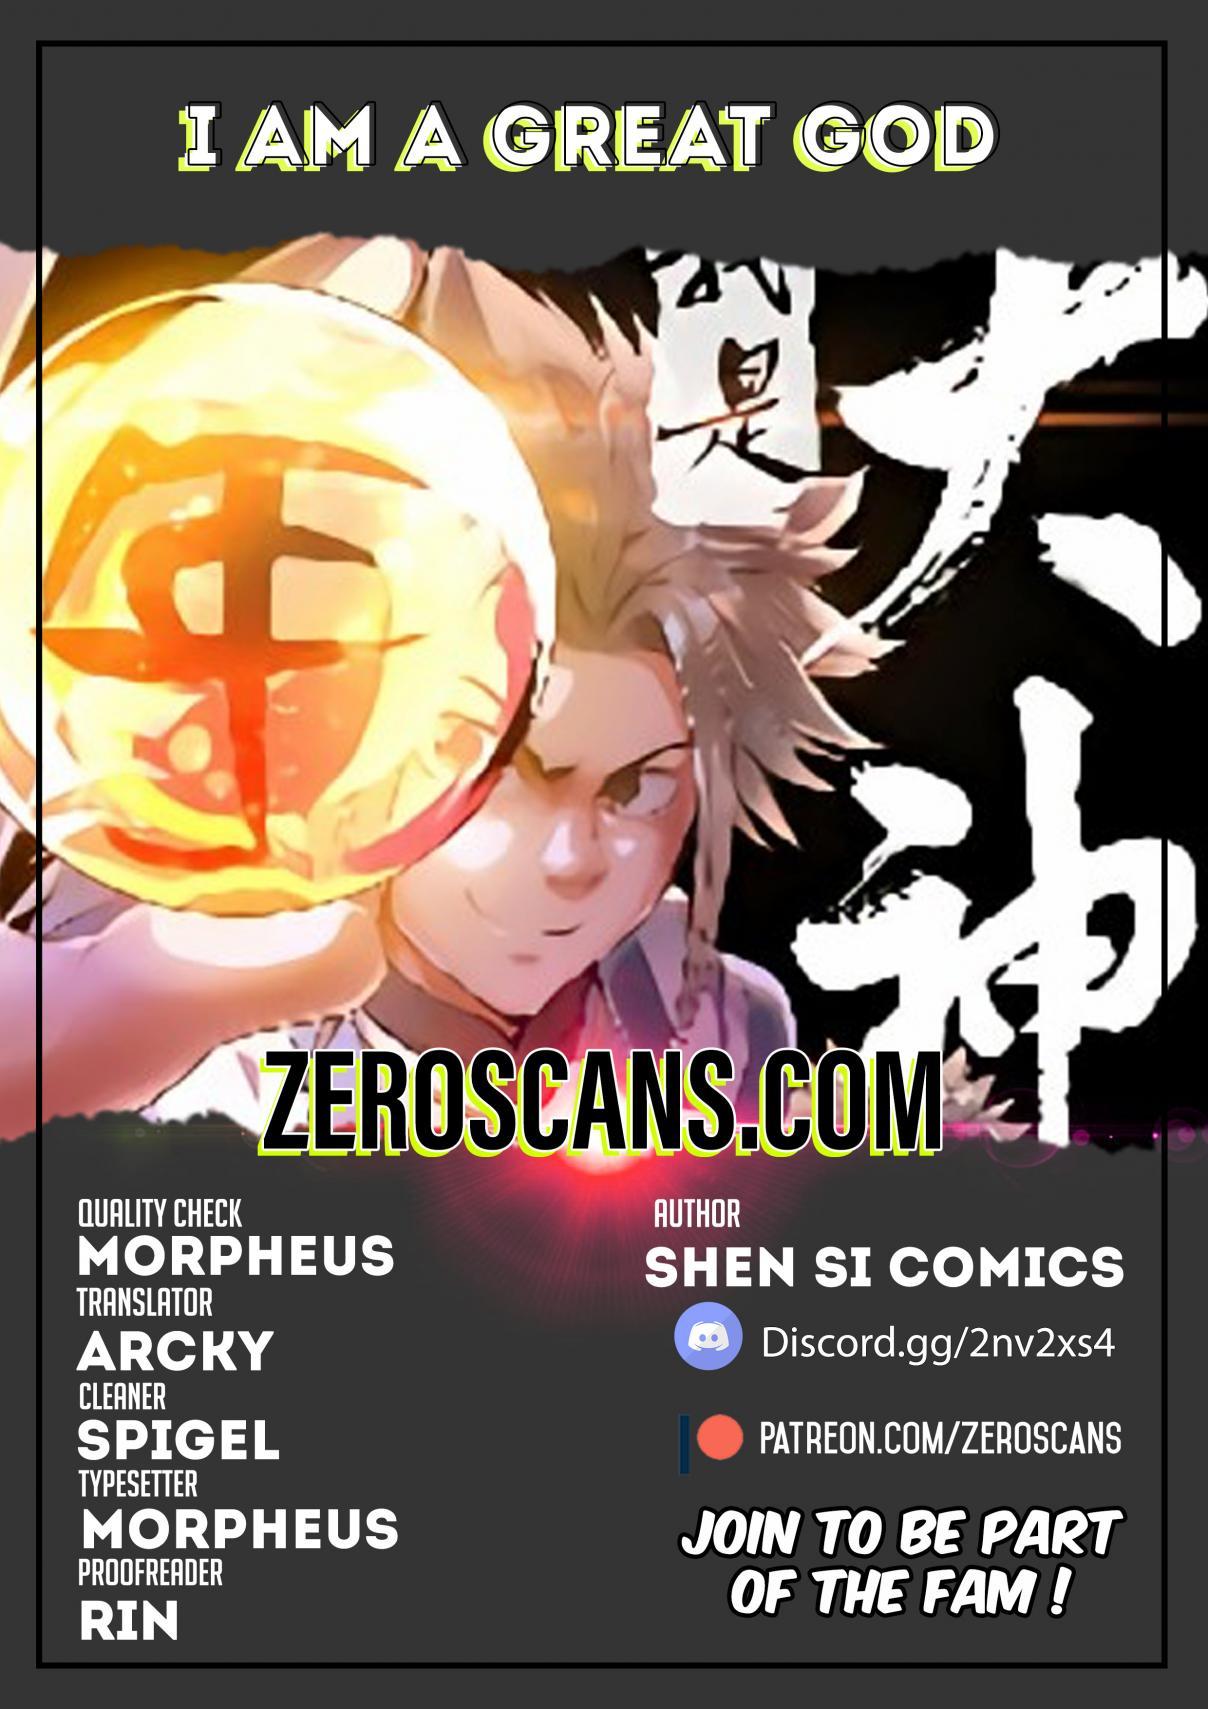 https://im.nineanime.com/comics/pic9/4/21124/491111/b464d8ccff7bf47688f59c0fc4403b5b.jpg Page 1